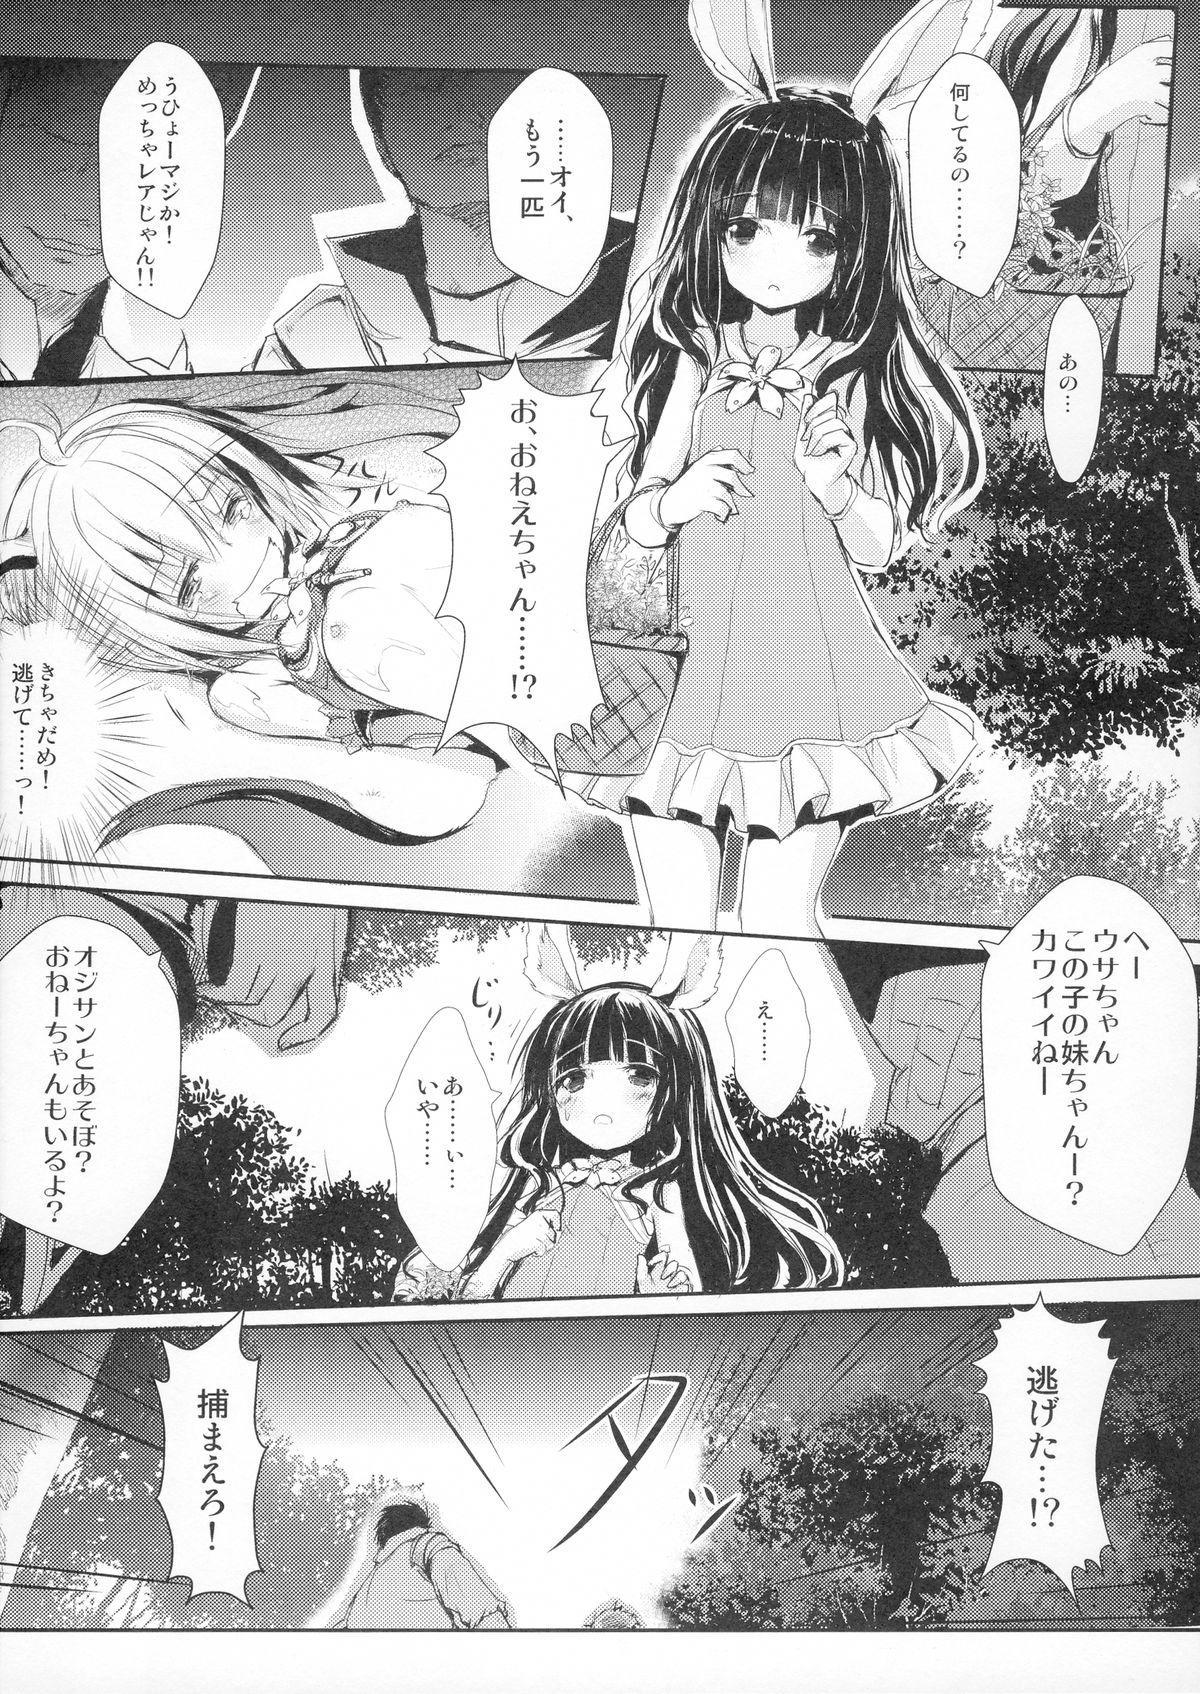 [Mirukomi (PRIMIL)] Human wa Erin-chan ni Hidoi Koto Shitai yo ne - ELIN's the best - (TERA The Exiled Realm of Arborea) 7